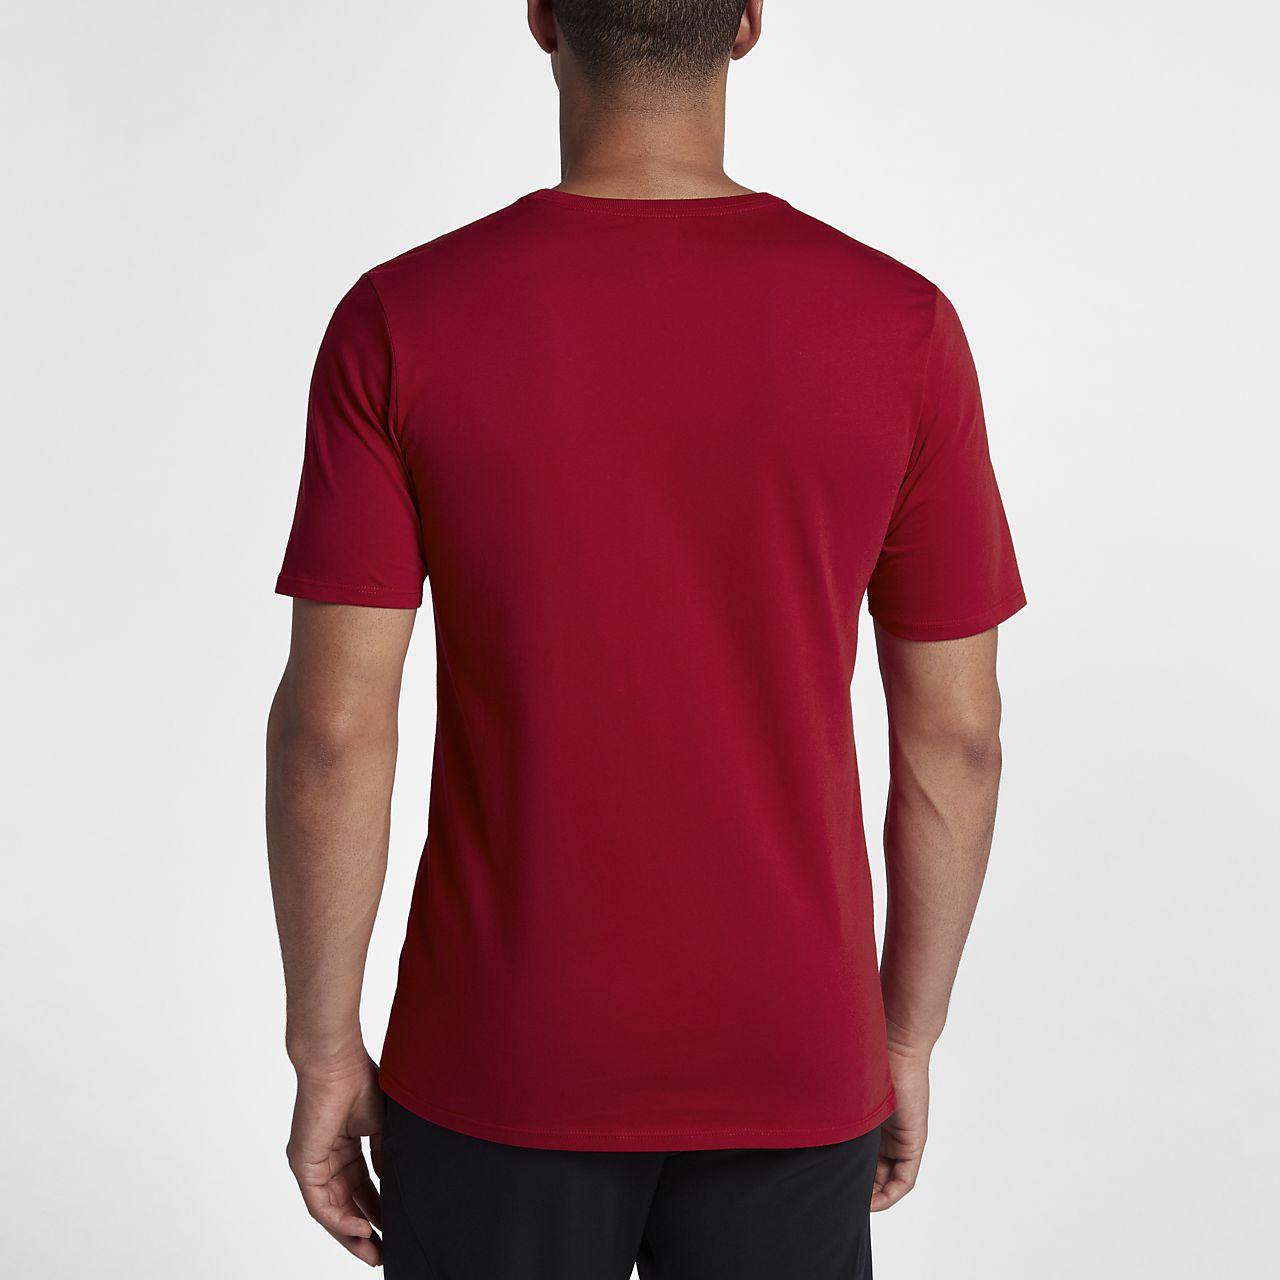 ... Jordan Lifestyle Iconic Jumpman Men's T-Shirt